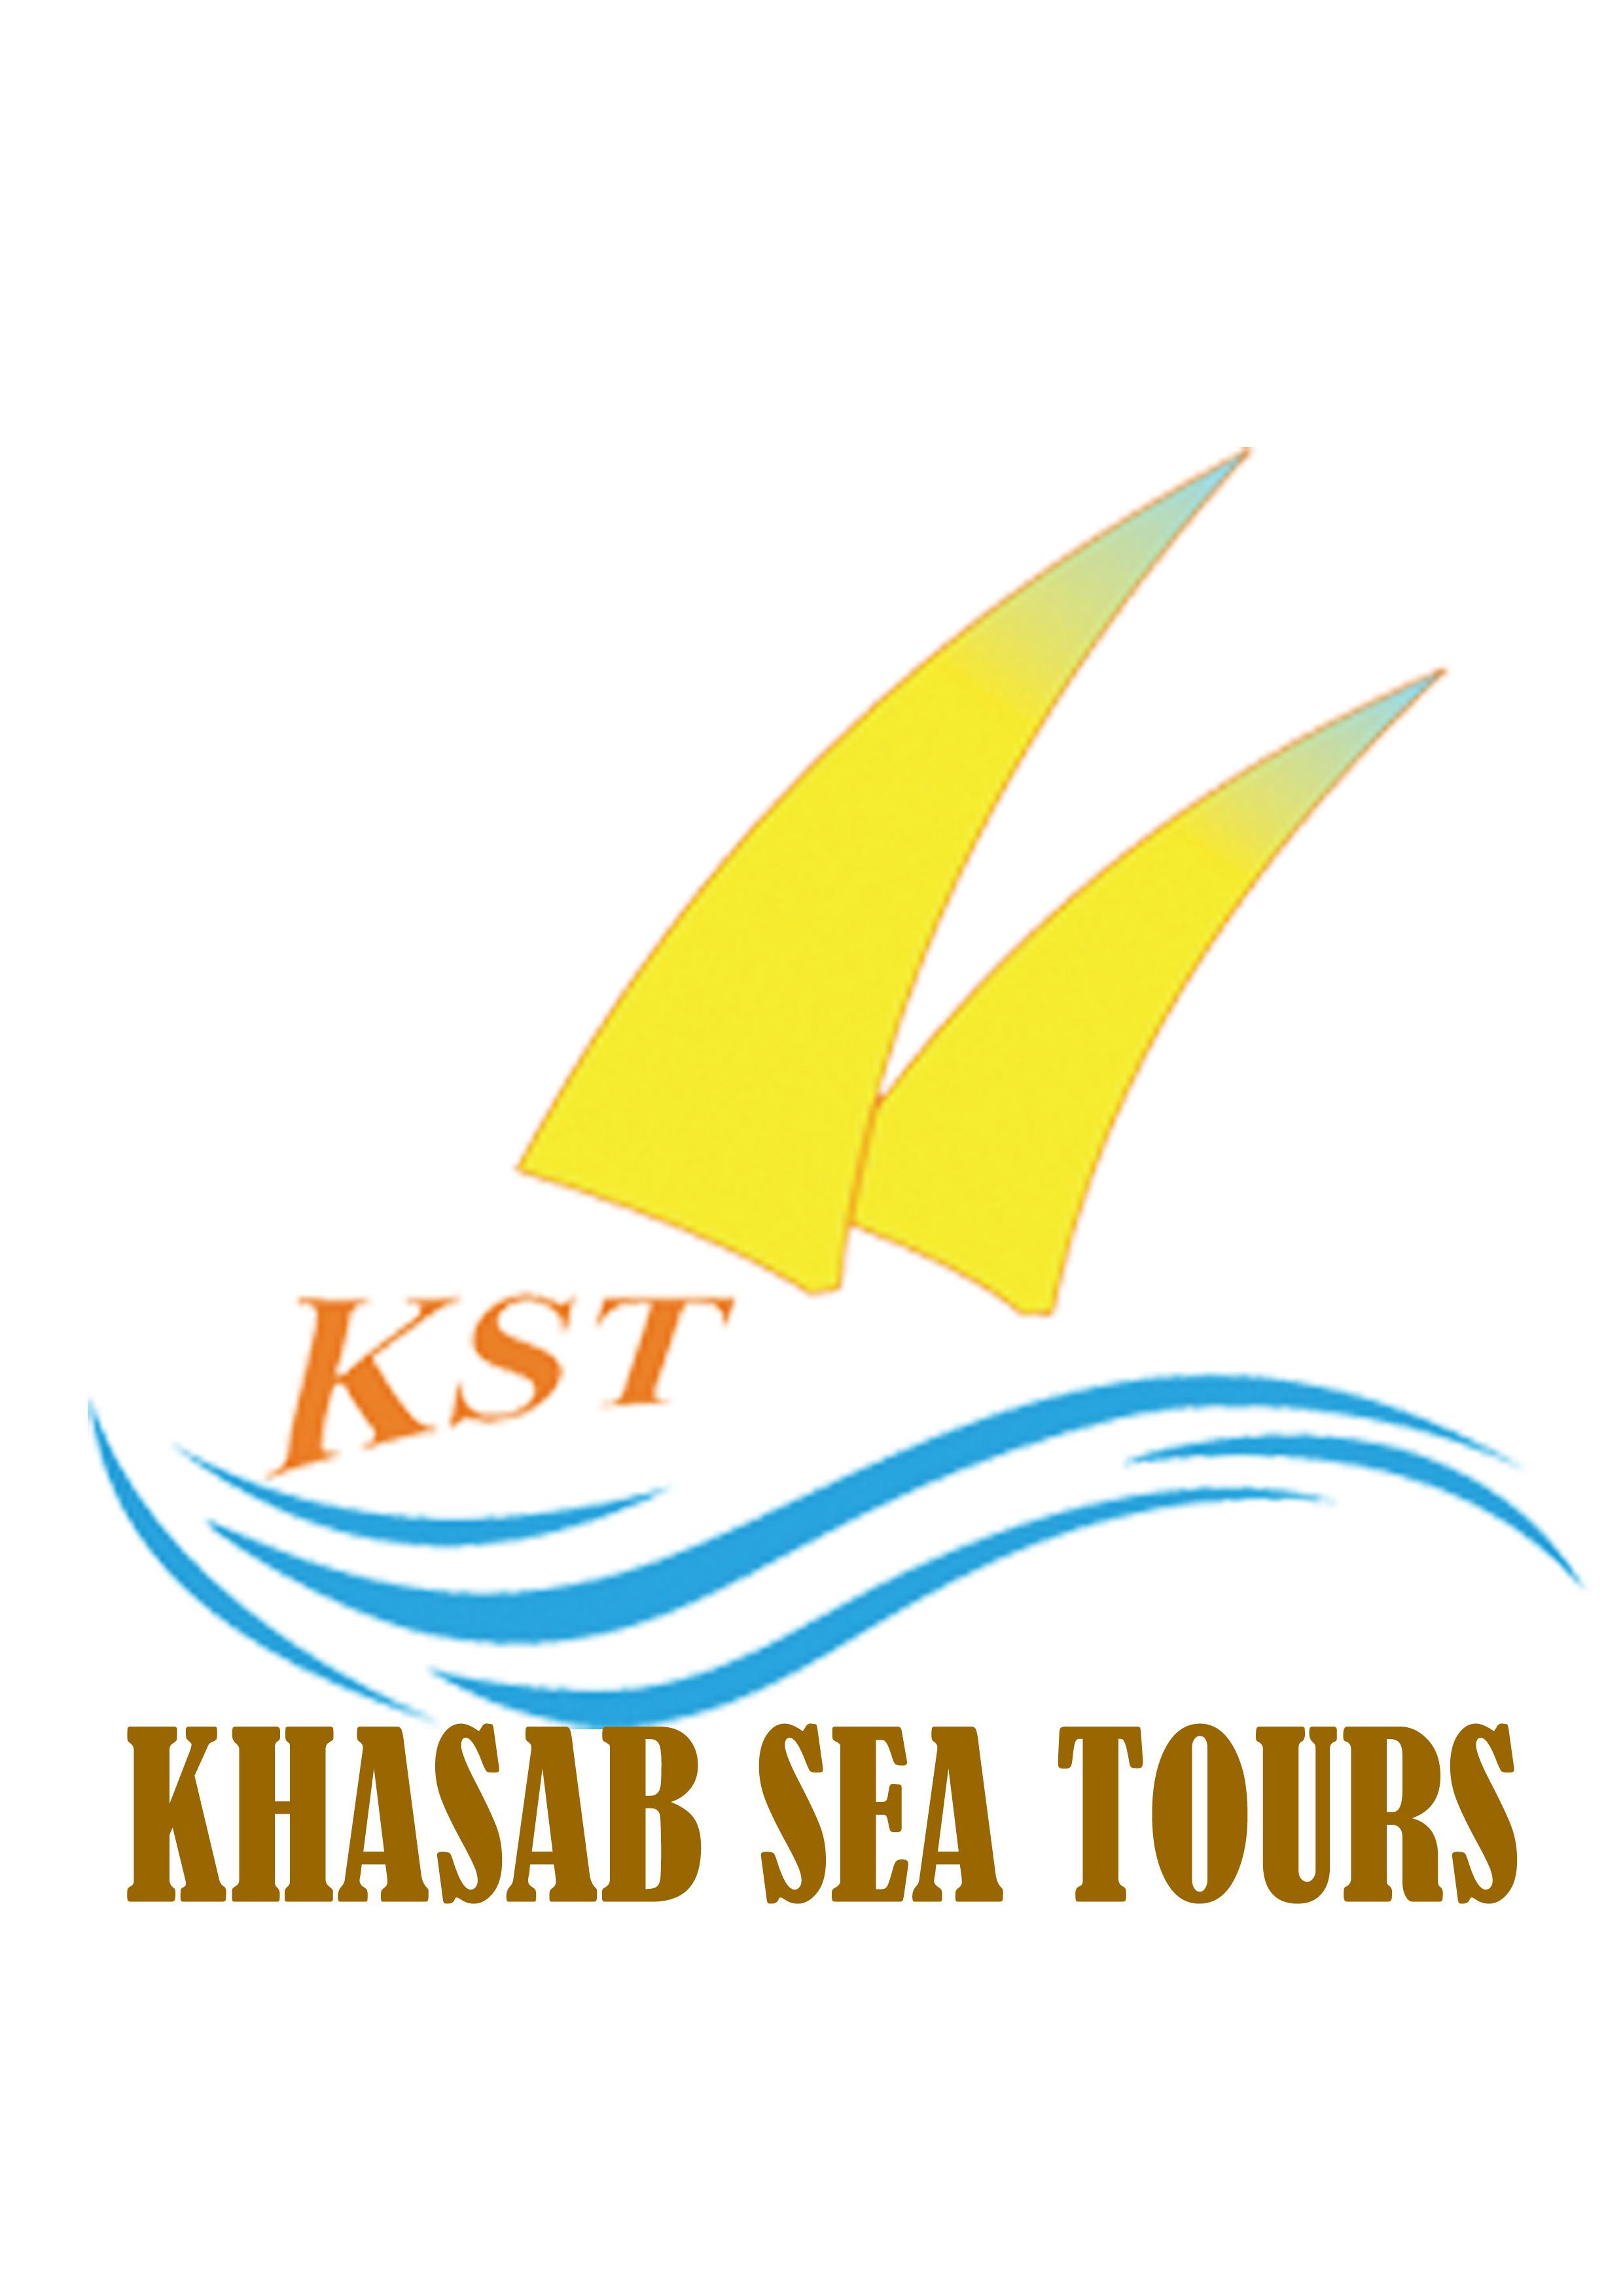 Khasab Sea Tours